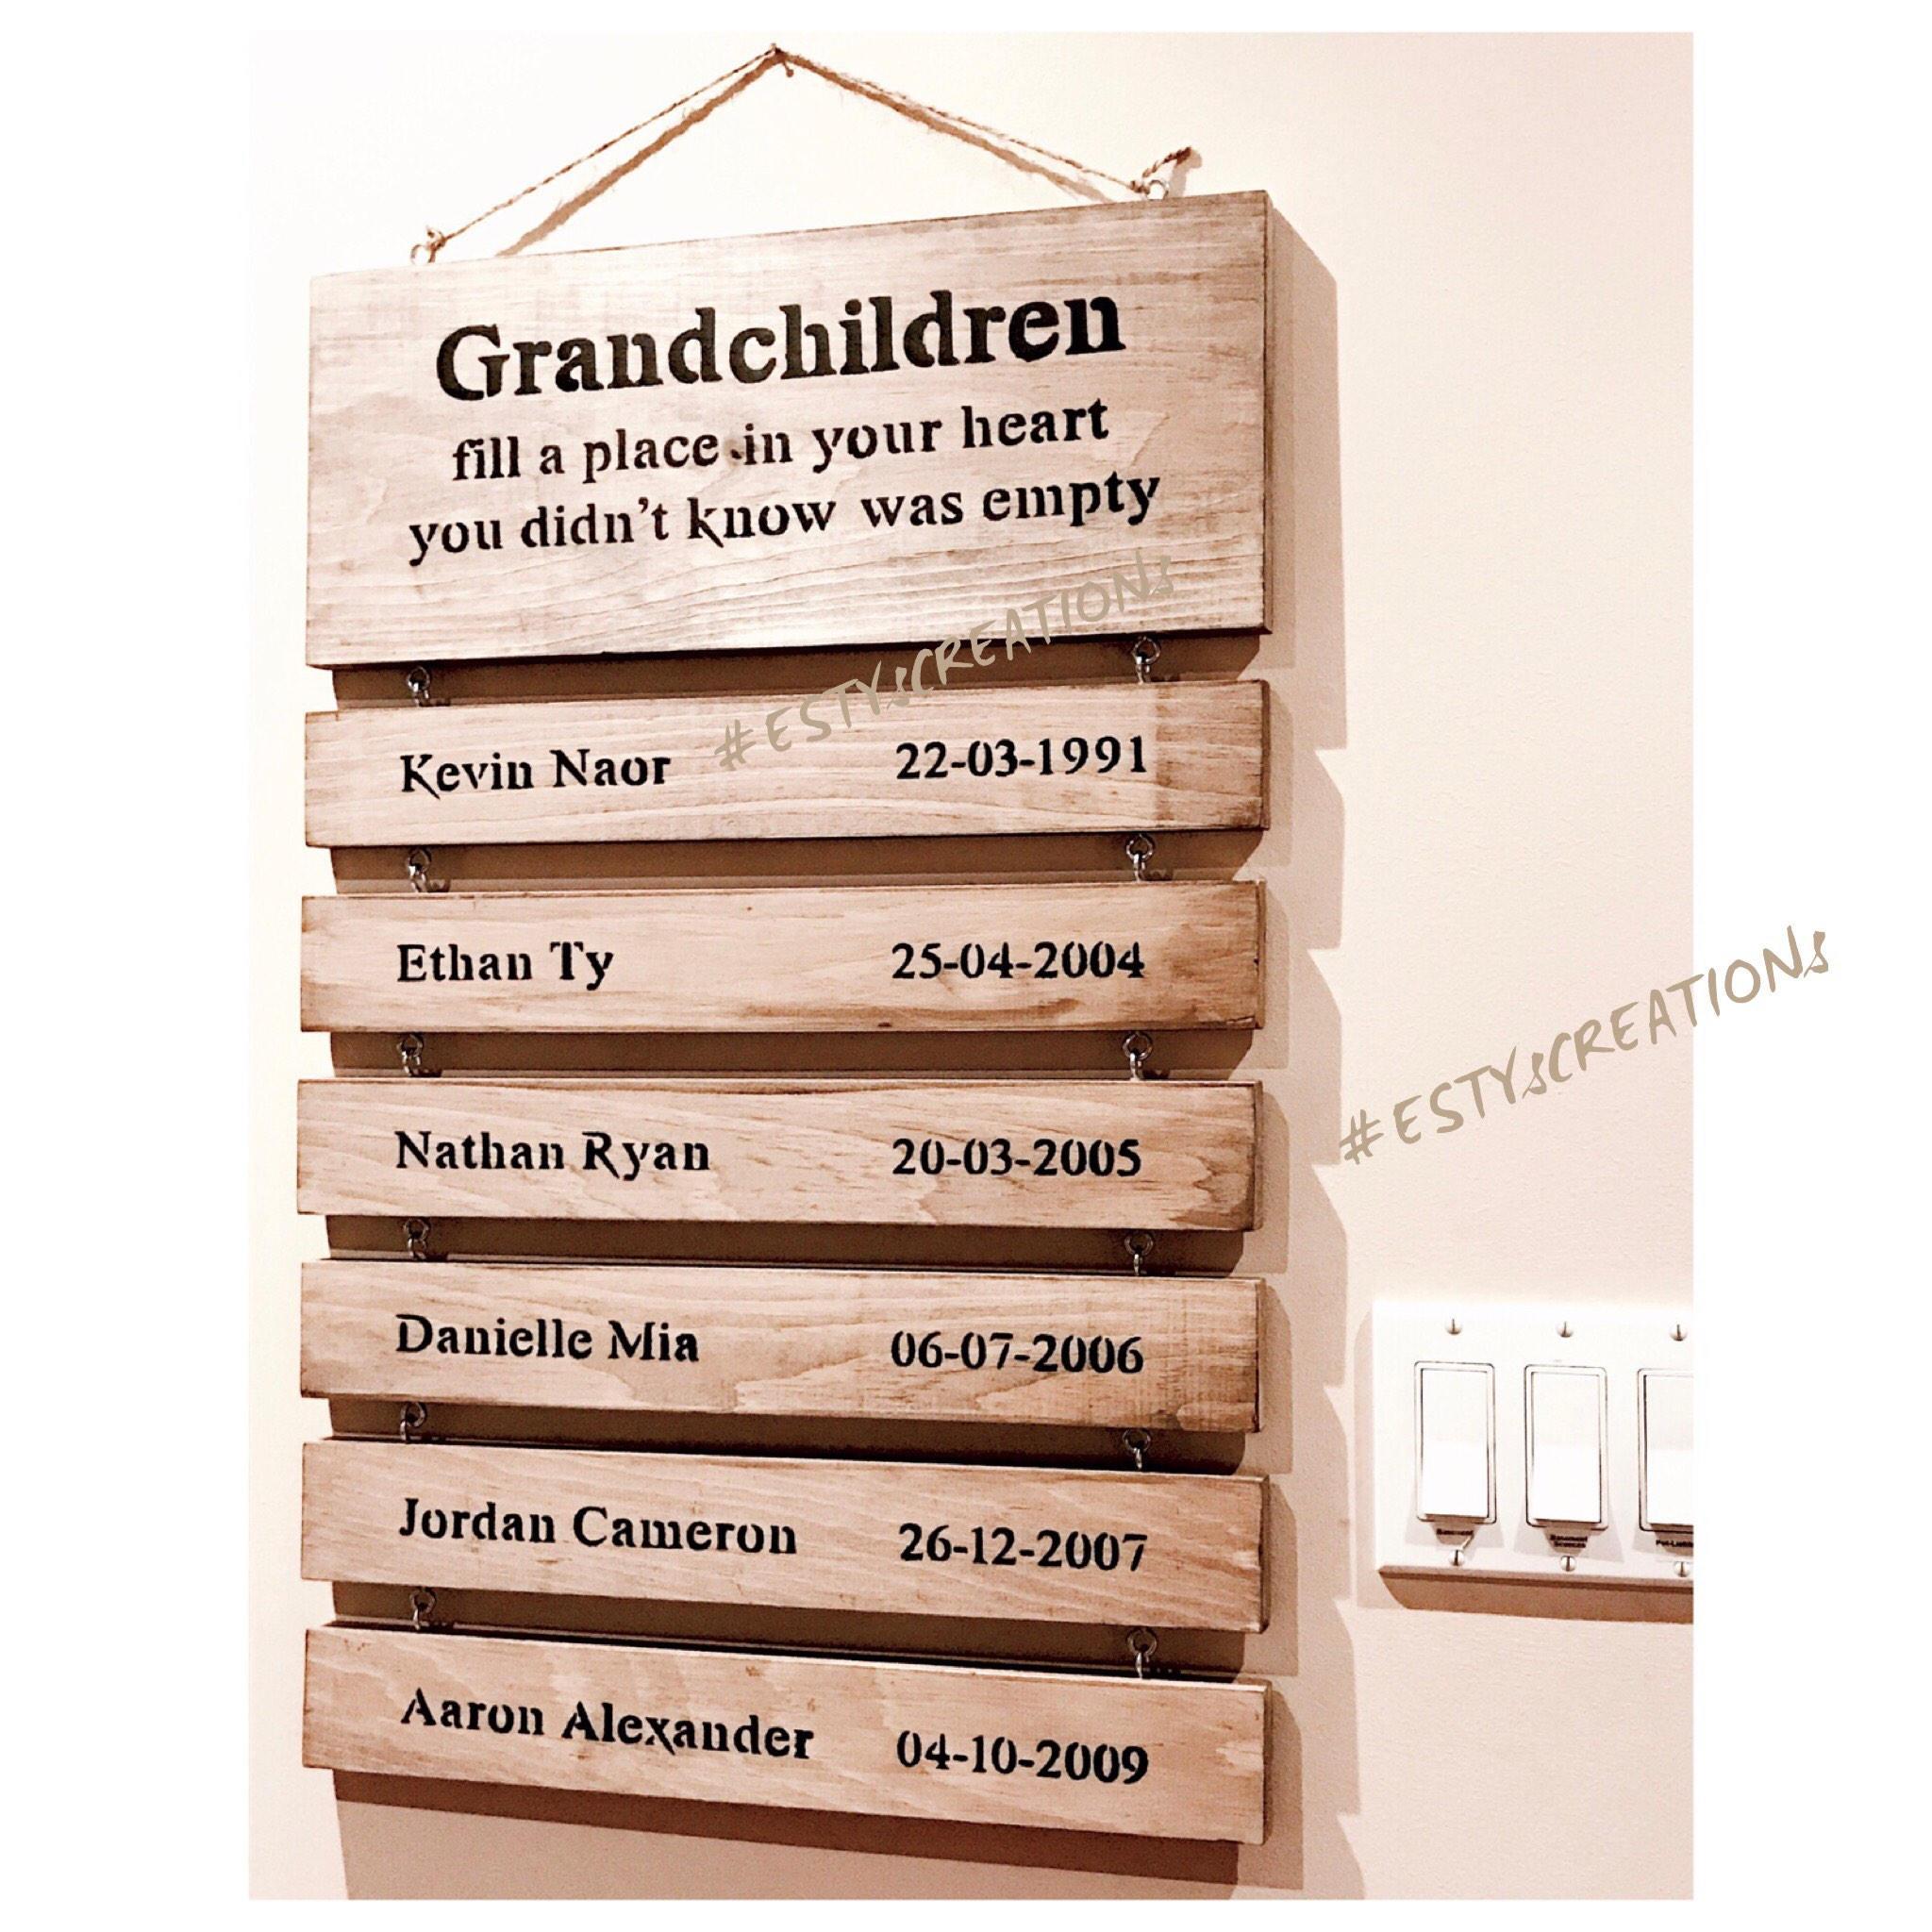 Custom Wooden Grandparents Sign With Grandkids Names Grandchildren Birthdates Personalized Anniversary Gift For The Grandparents